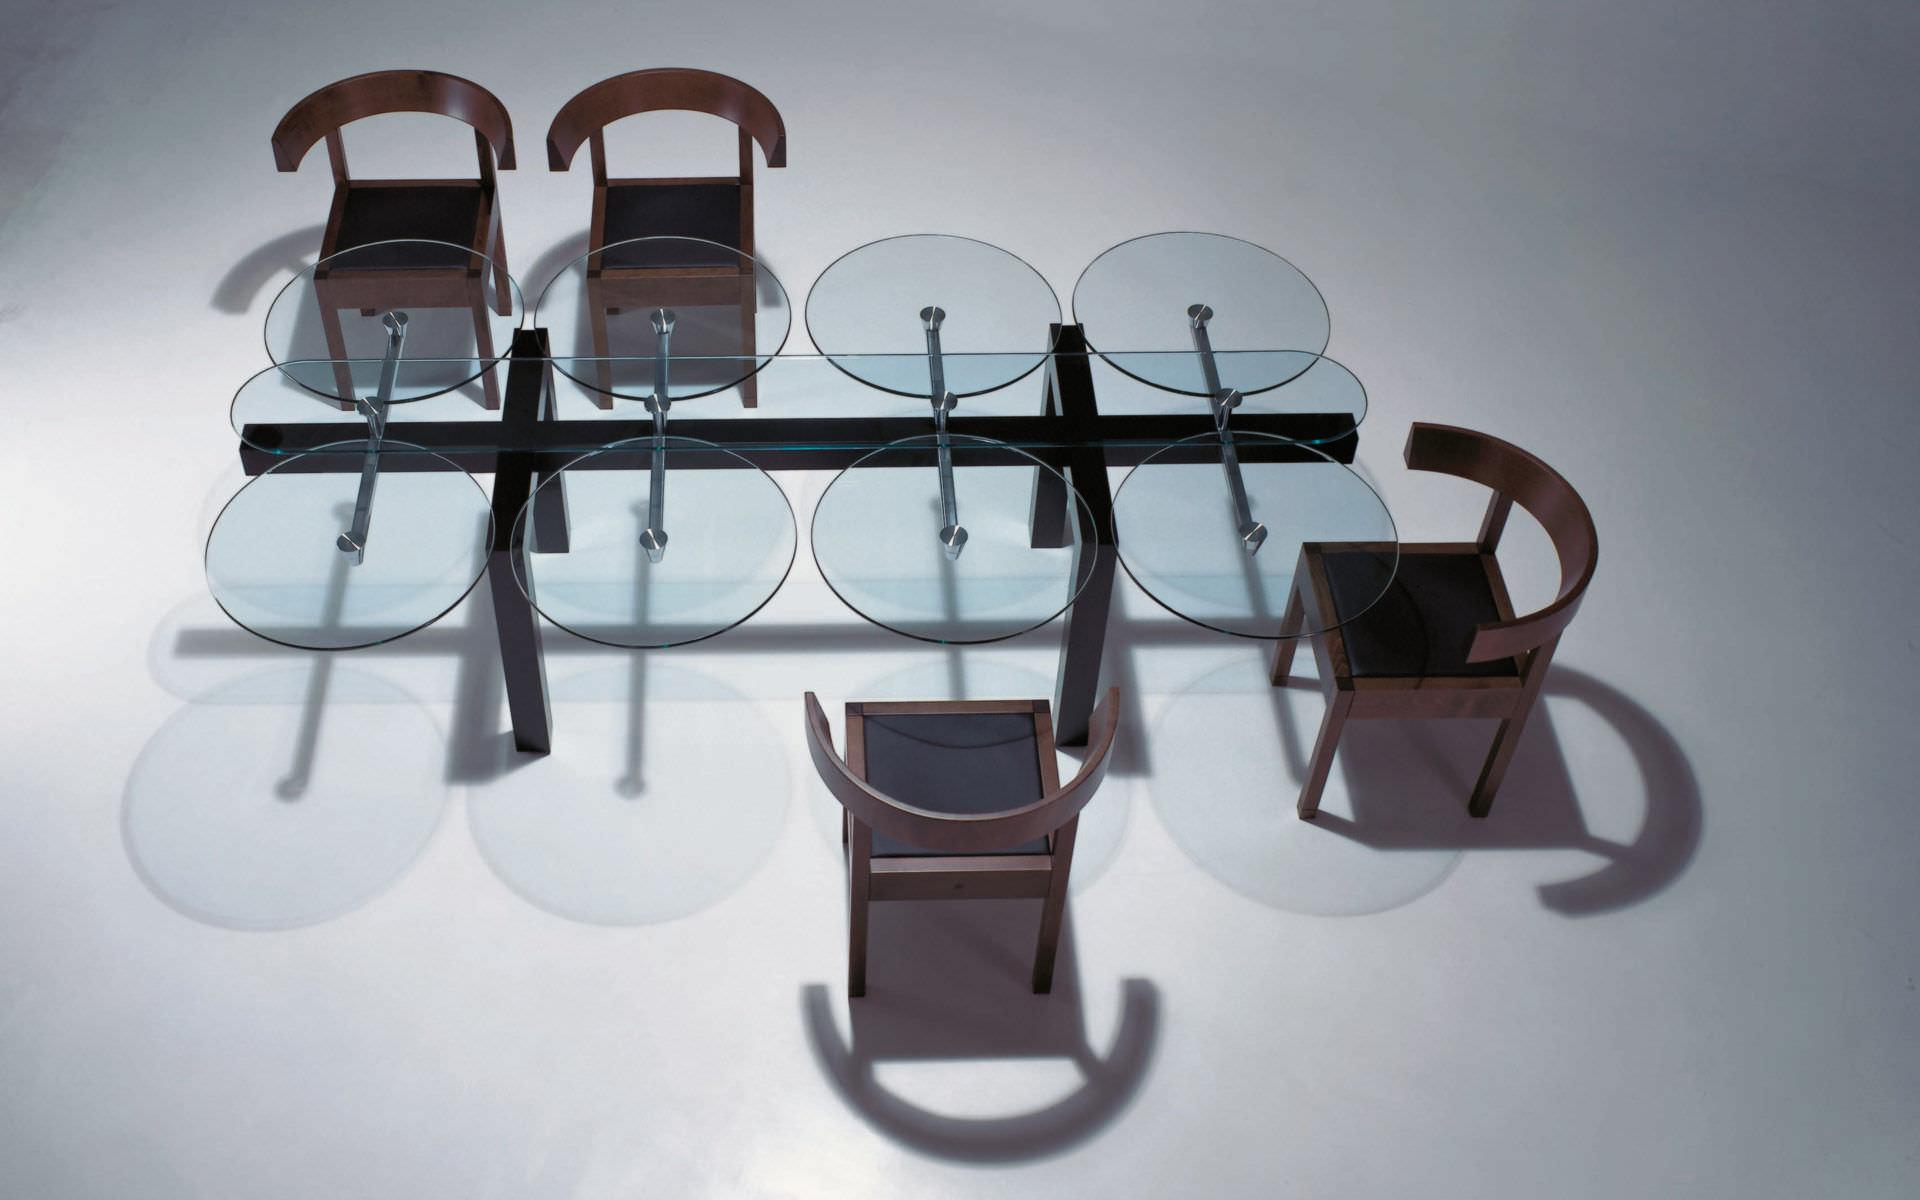 dining-table-original-design-mdf-glass-49455-4778931.jpg